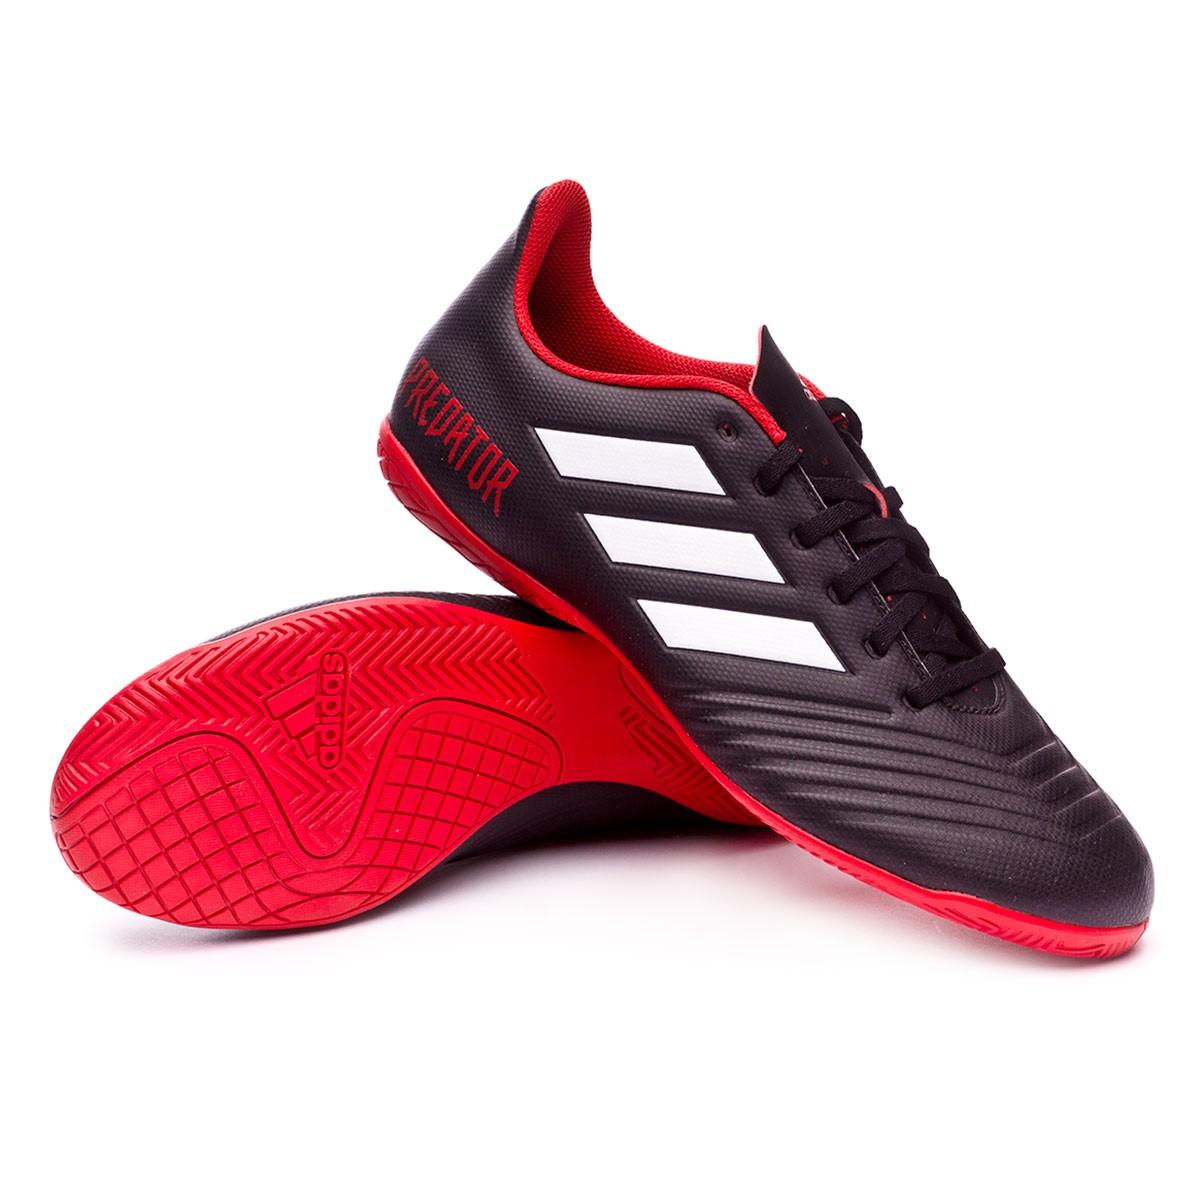 30191a622 Futsal Boot adidas Predator Tango 18.4 IN Core black-White-Red - Football  store Fútbol Emotion